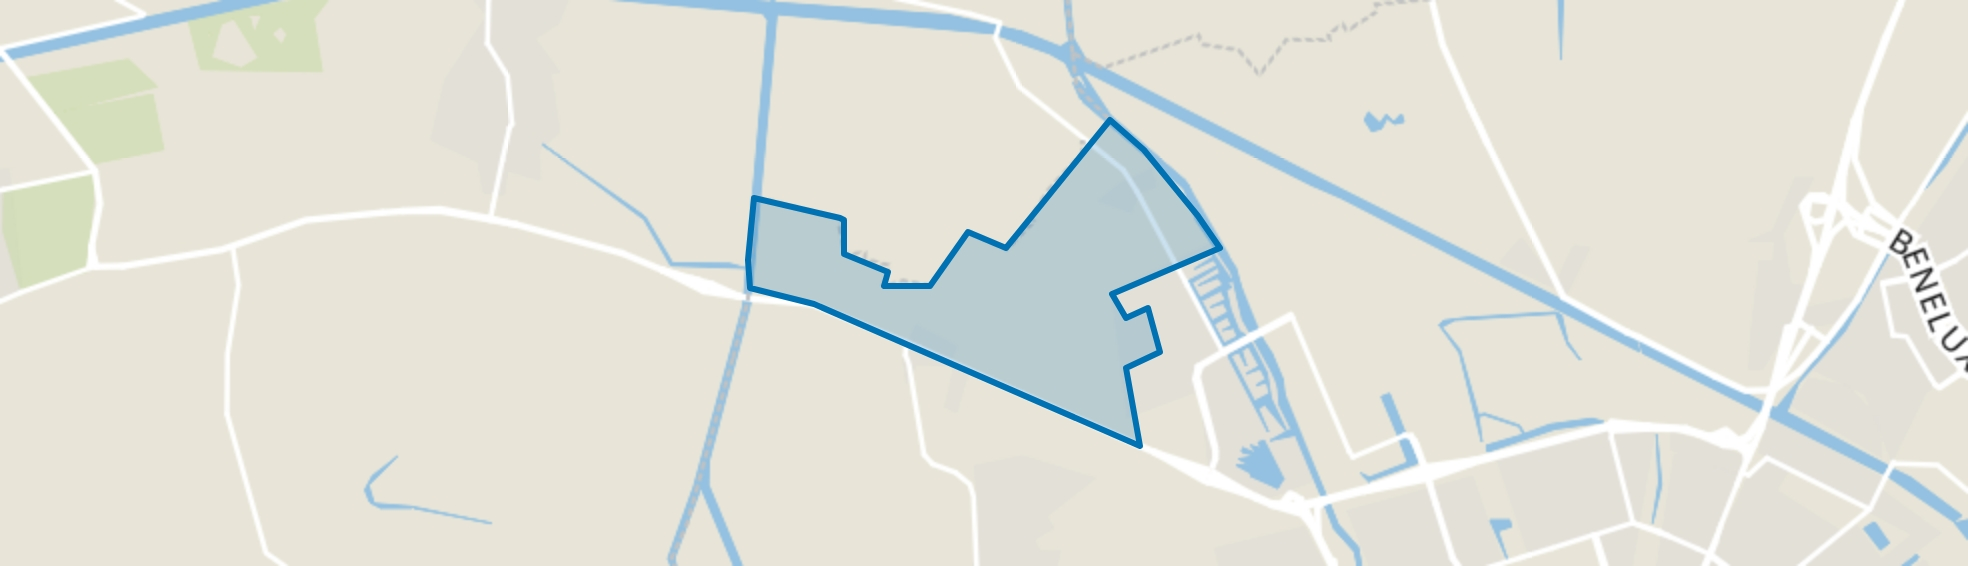 Dorkwerd, Groningen map